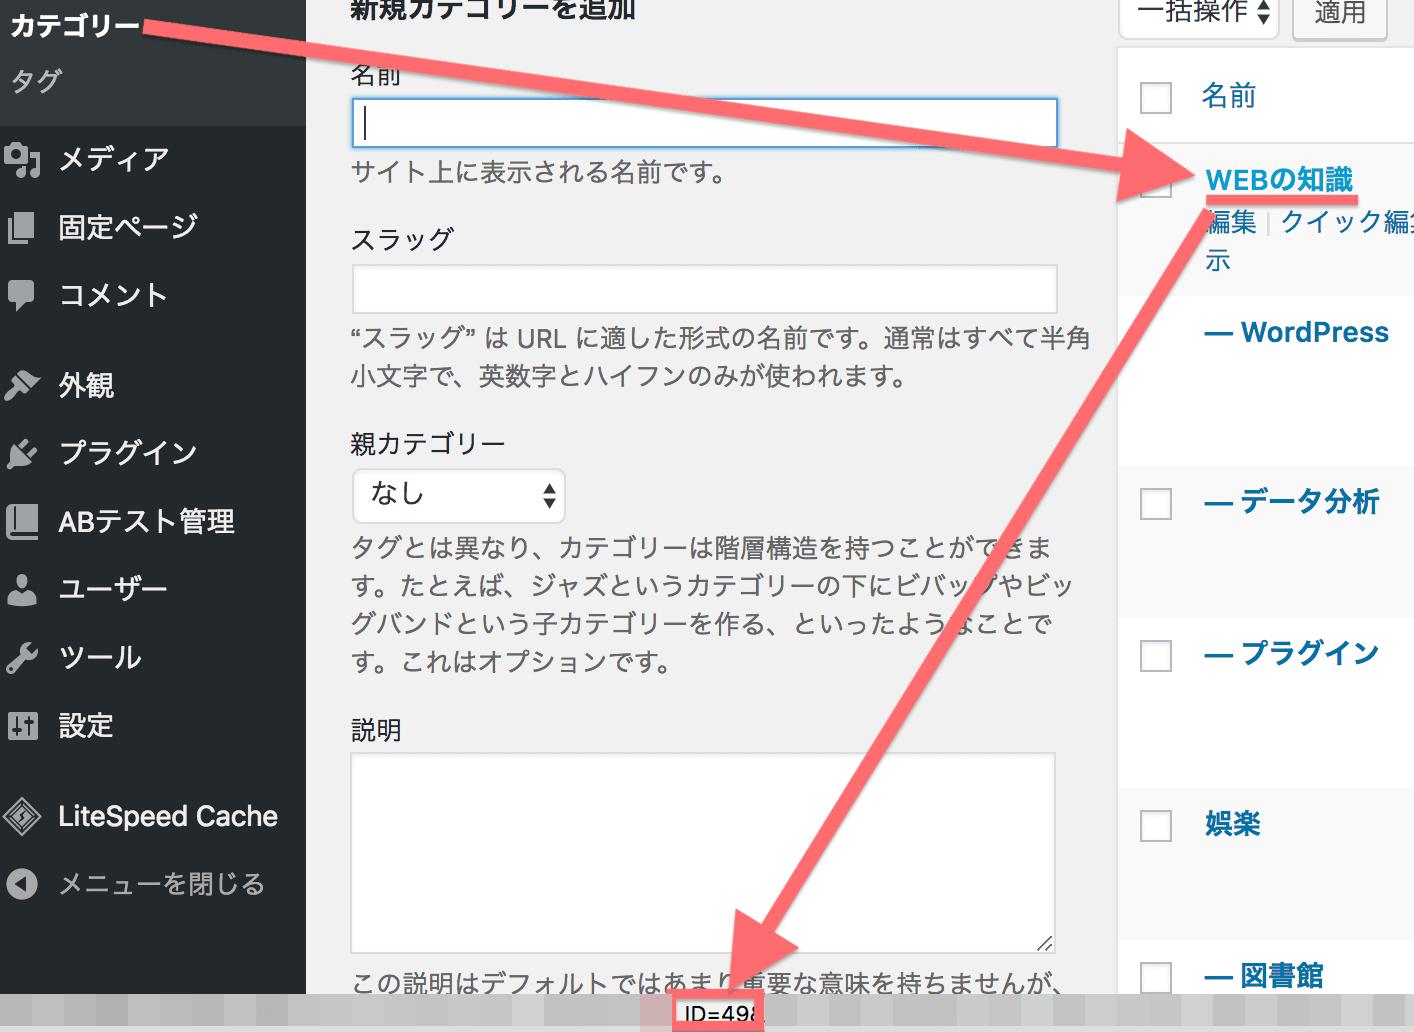 WordPressカテゴリーID確認方法